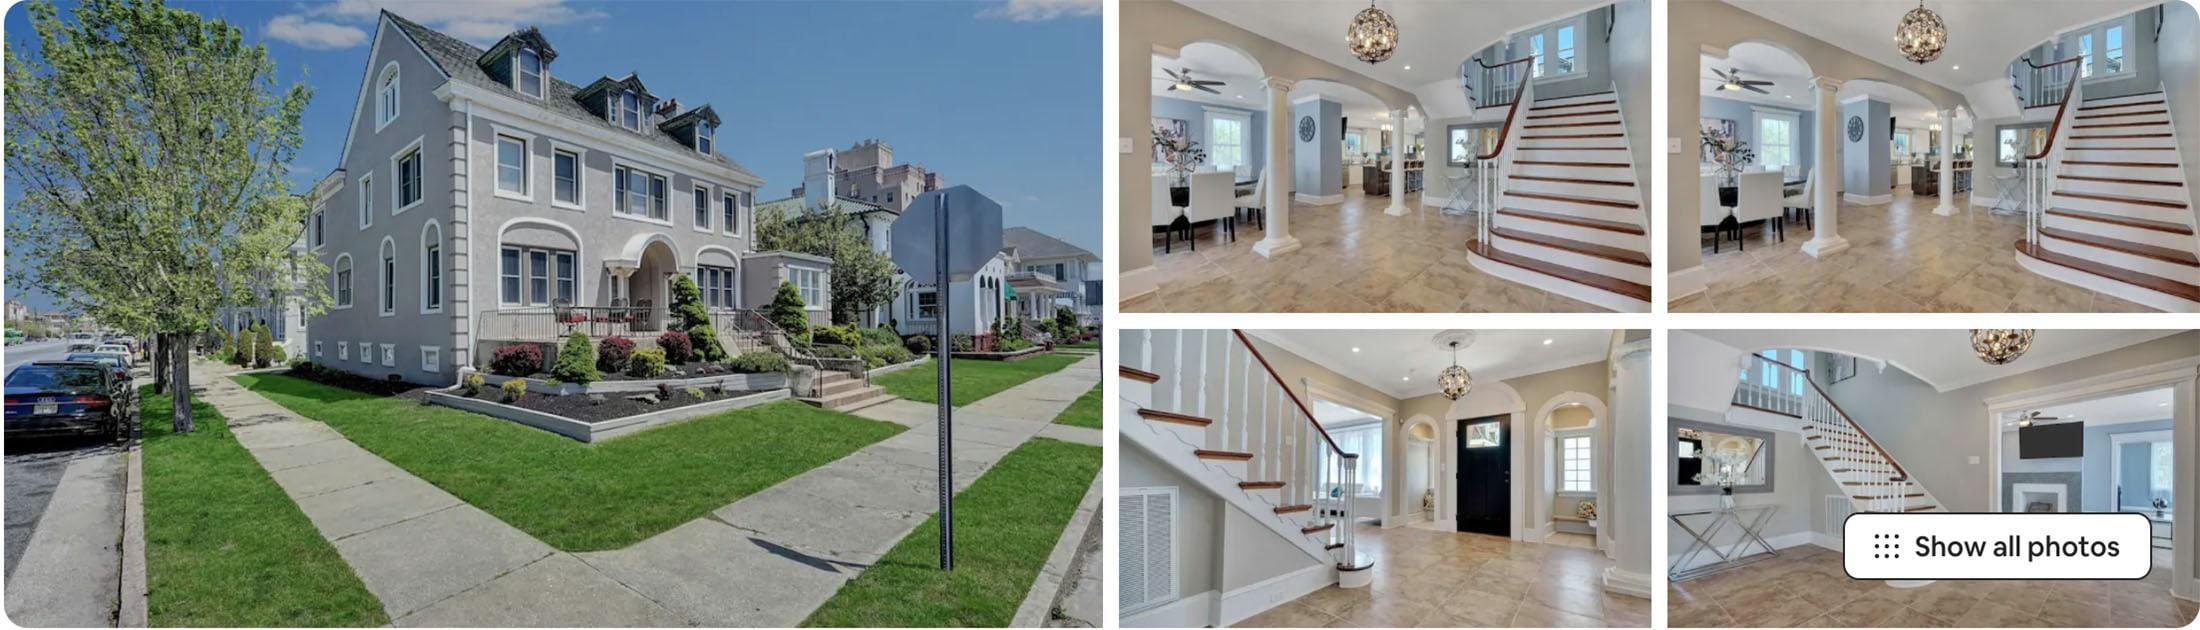 Atlantic City Airbnb mansion